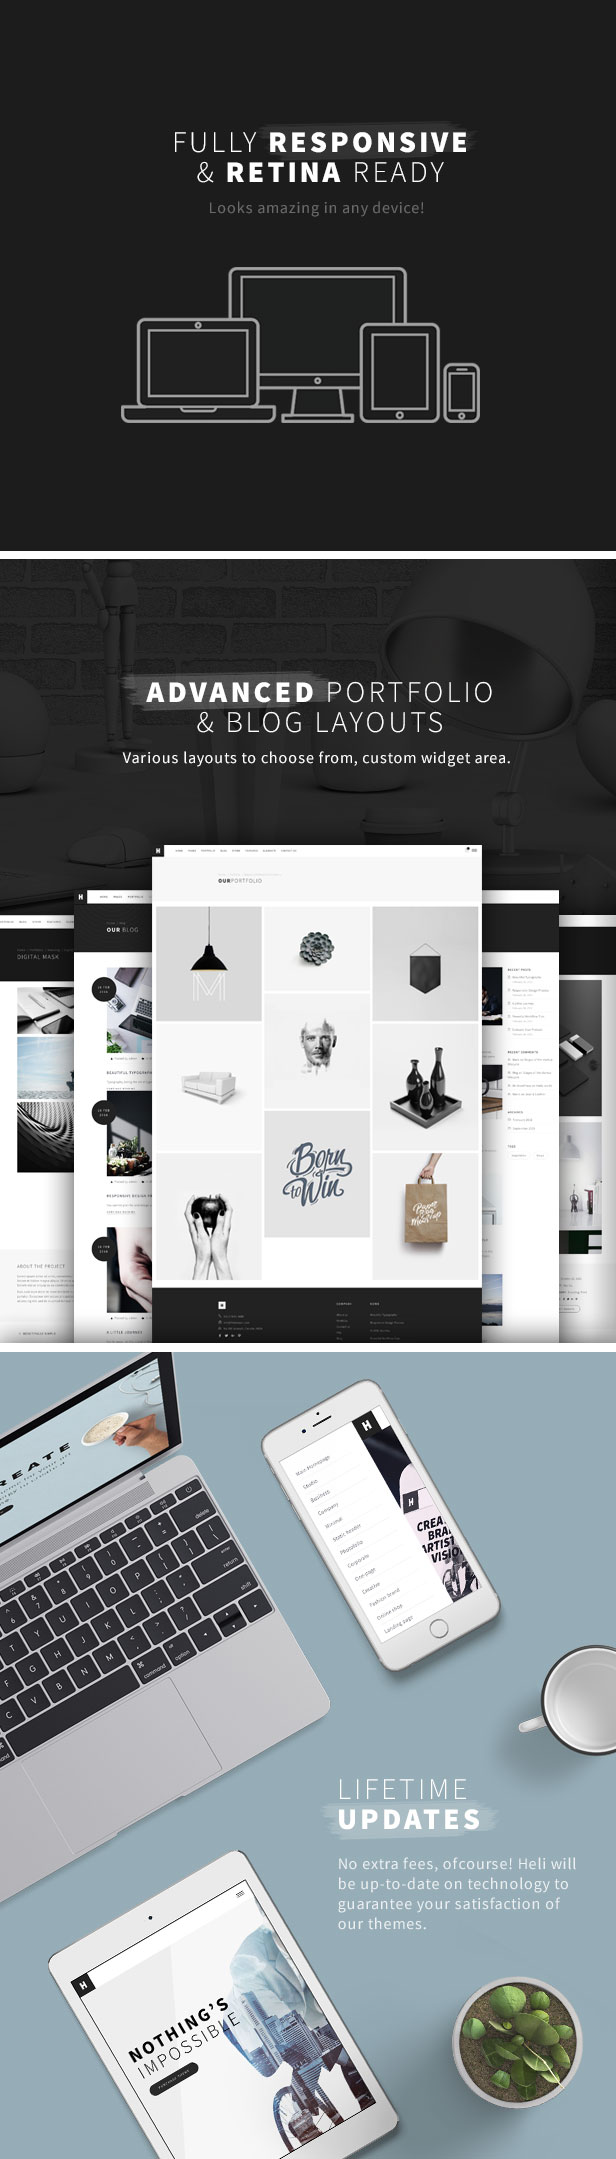 1622292823 481 12 - Heli - Minimal Creative Black and White WordPress Theme